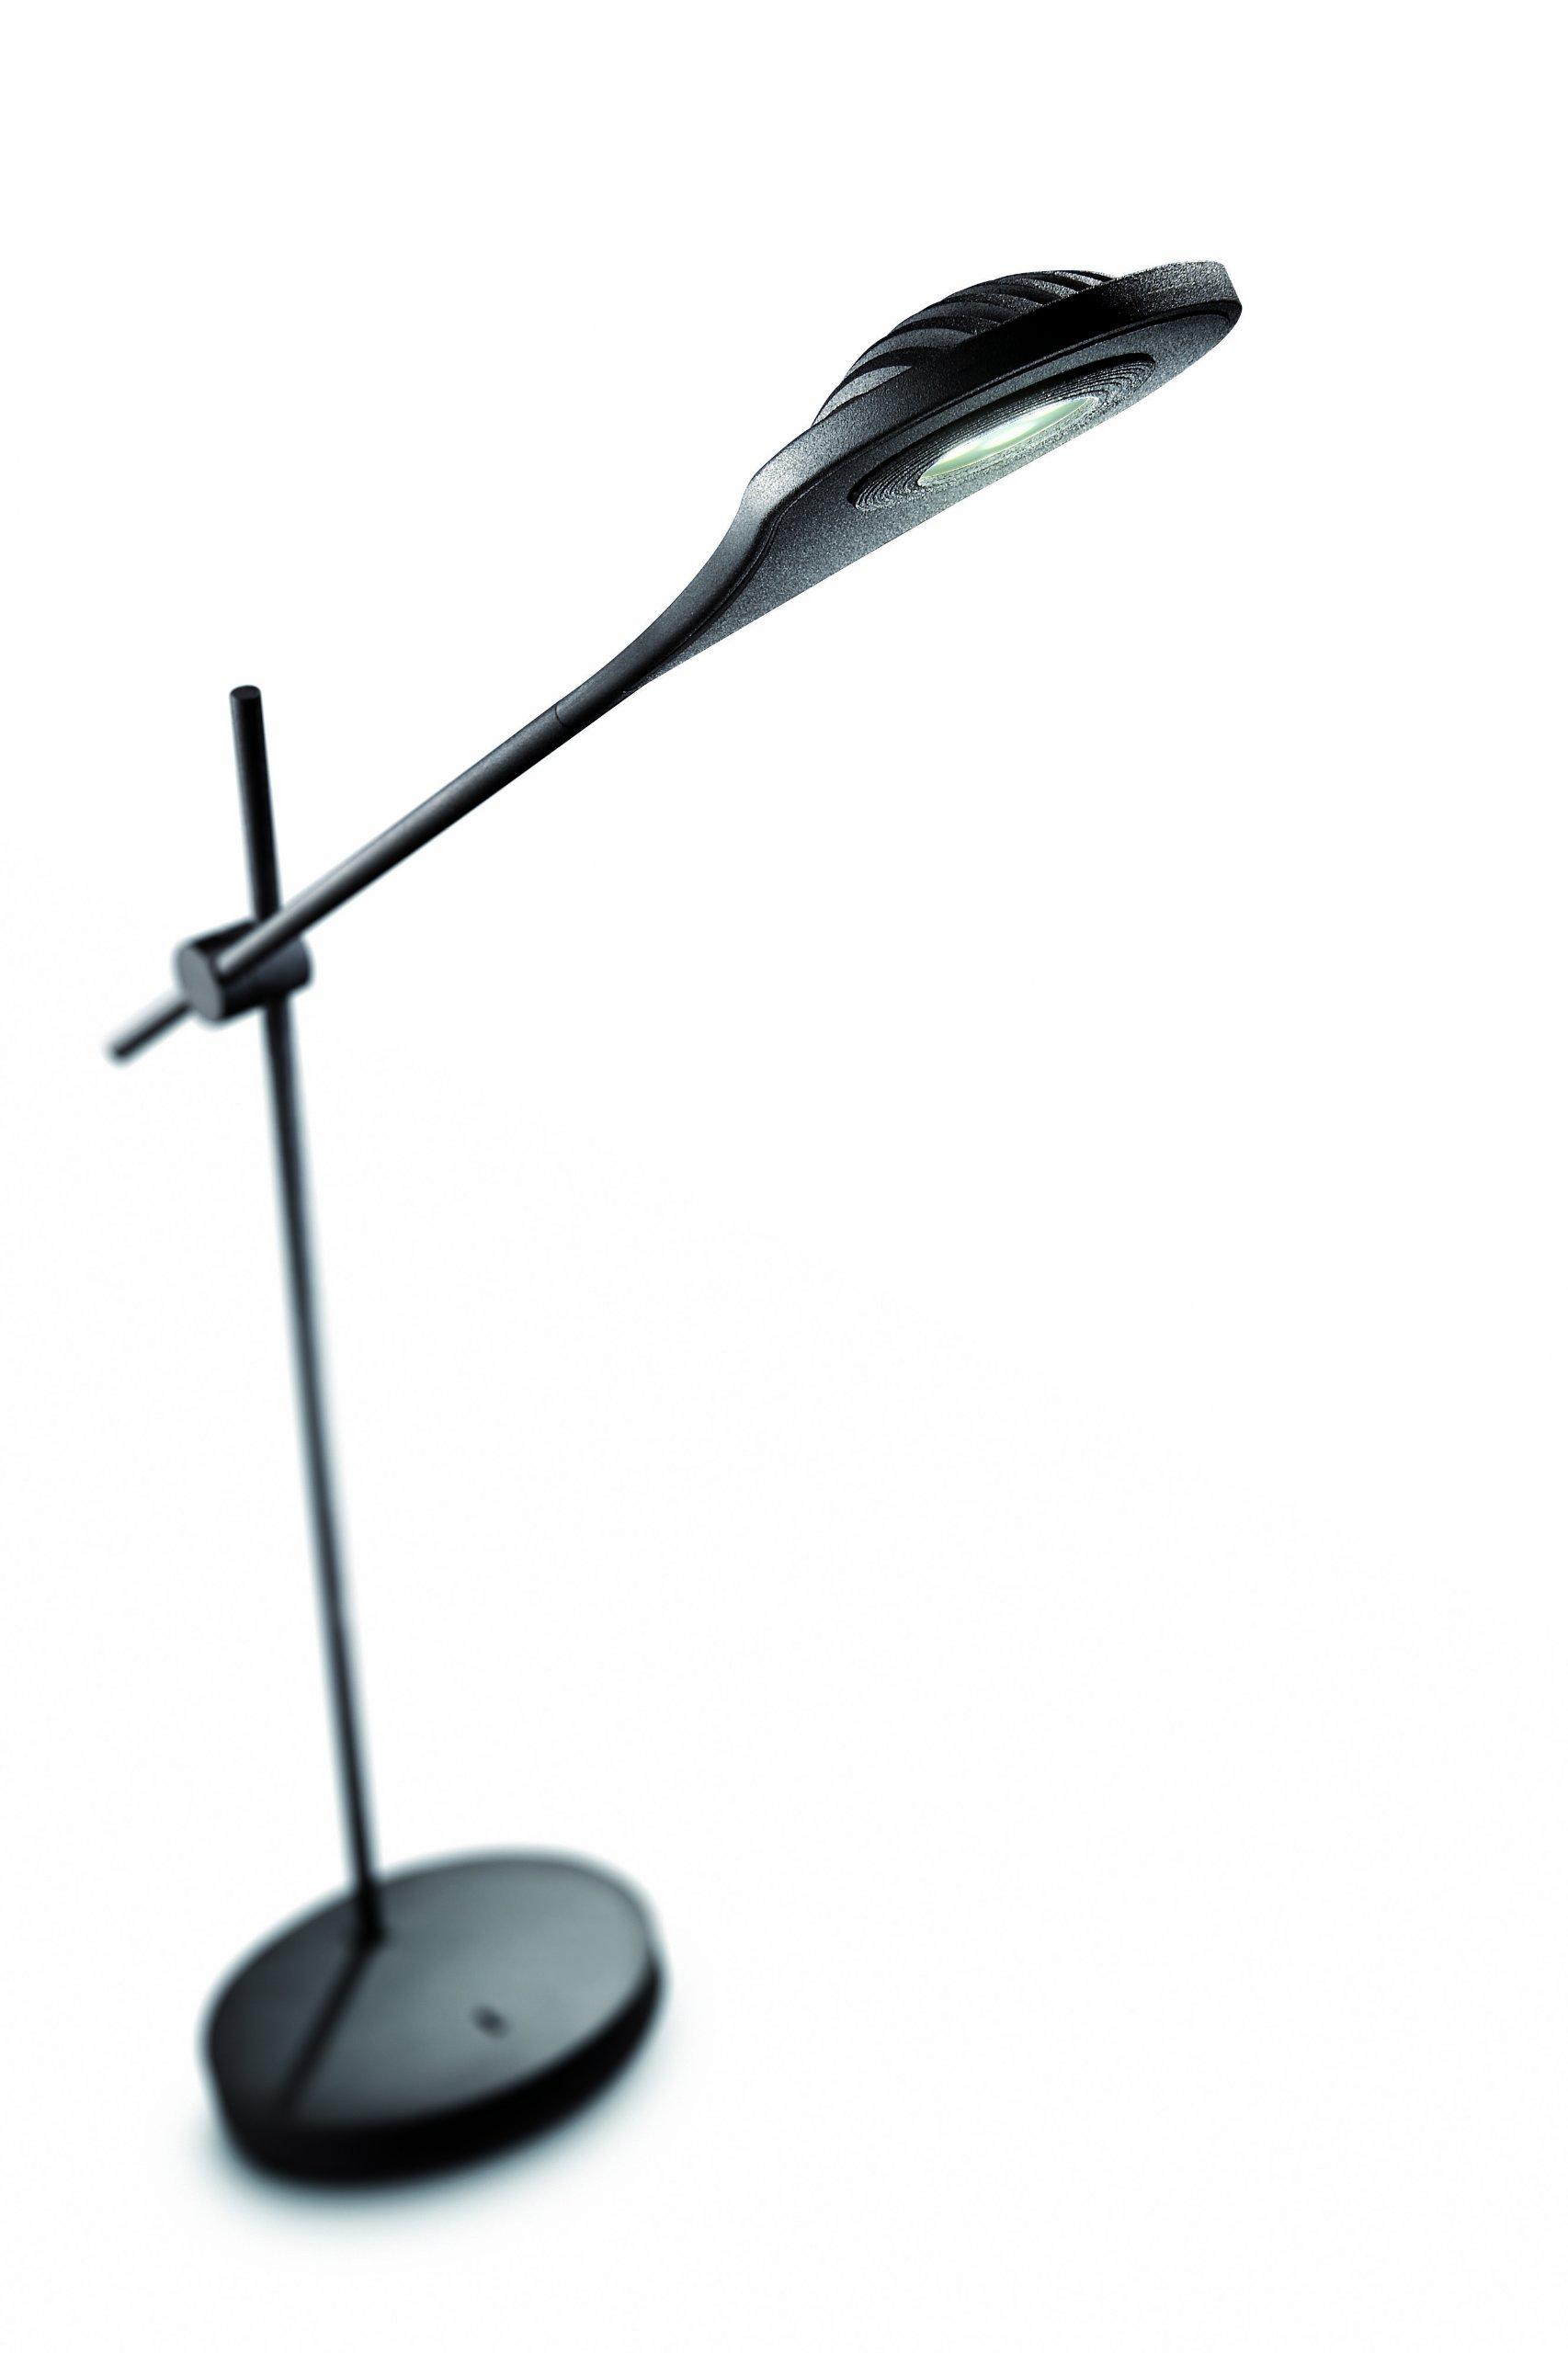 bedside lamp pendant lighting outdoor chandelier light sydney voltage hanging top tiffany lamps modern interior screw lights desk fixtures low adjustable in magnificent australia